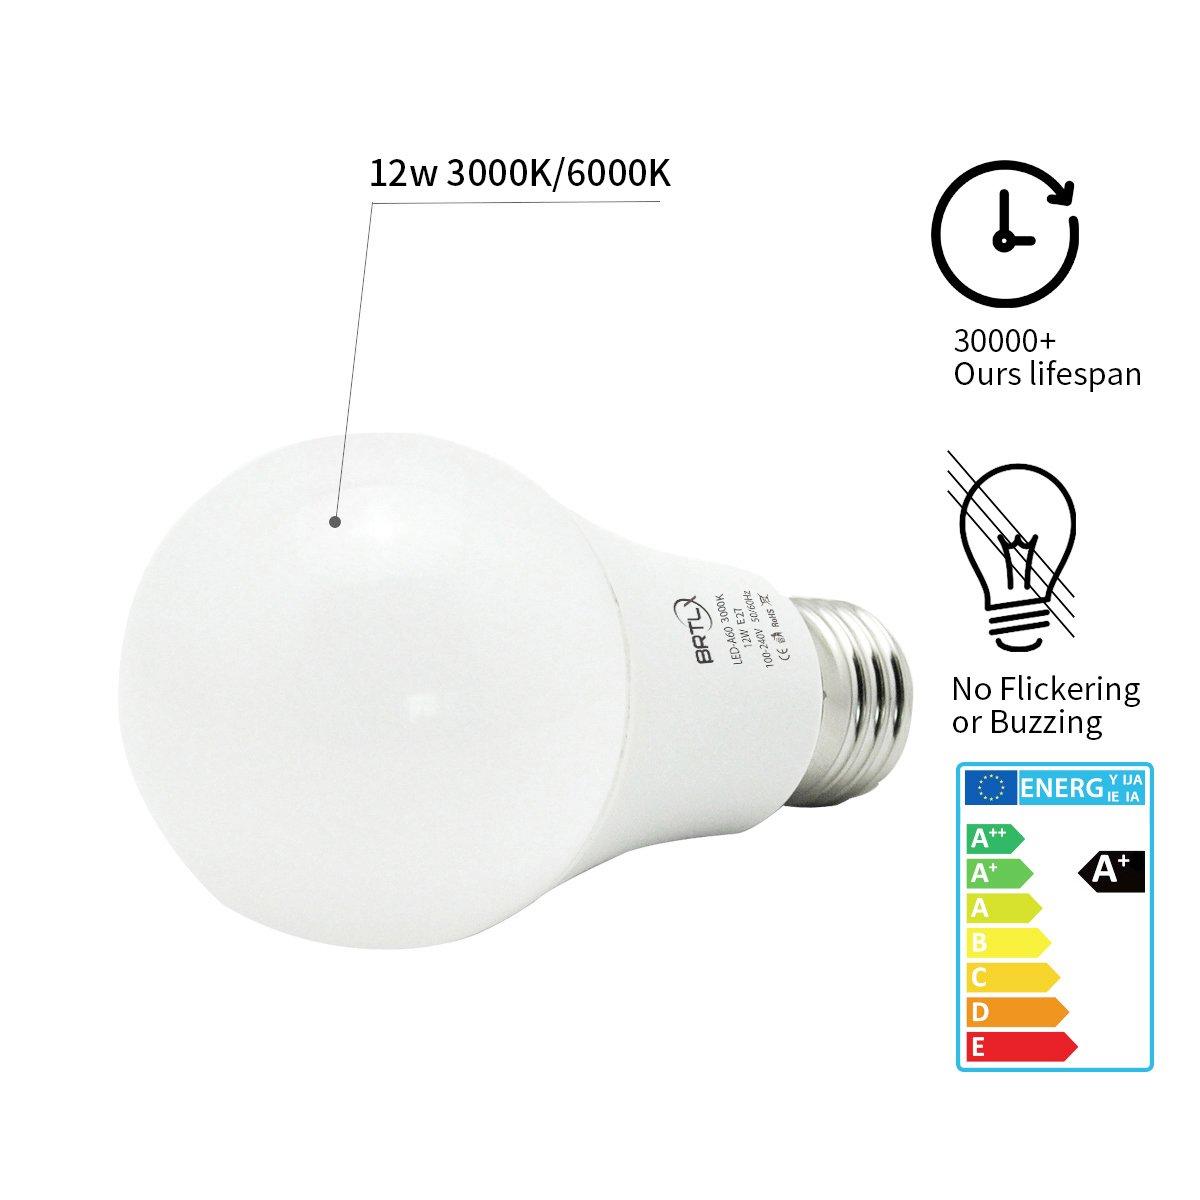 Brtlx E27 Led Bulbs A60 12w Warm White 3000k Edison Screw Light Bulb